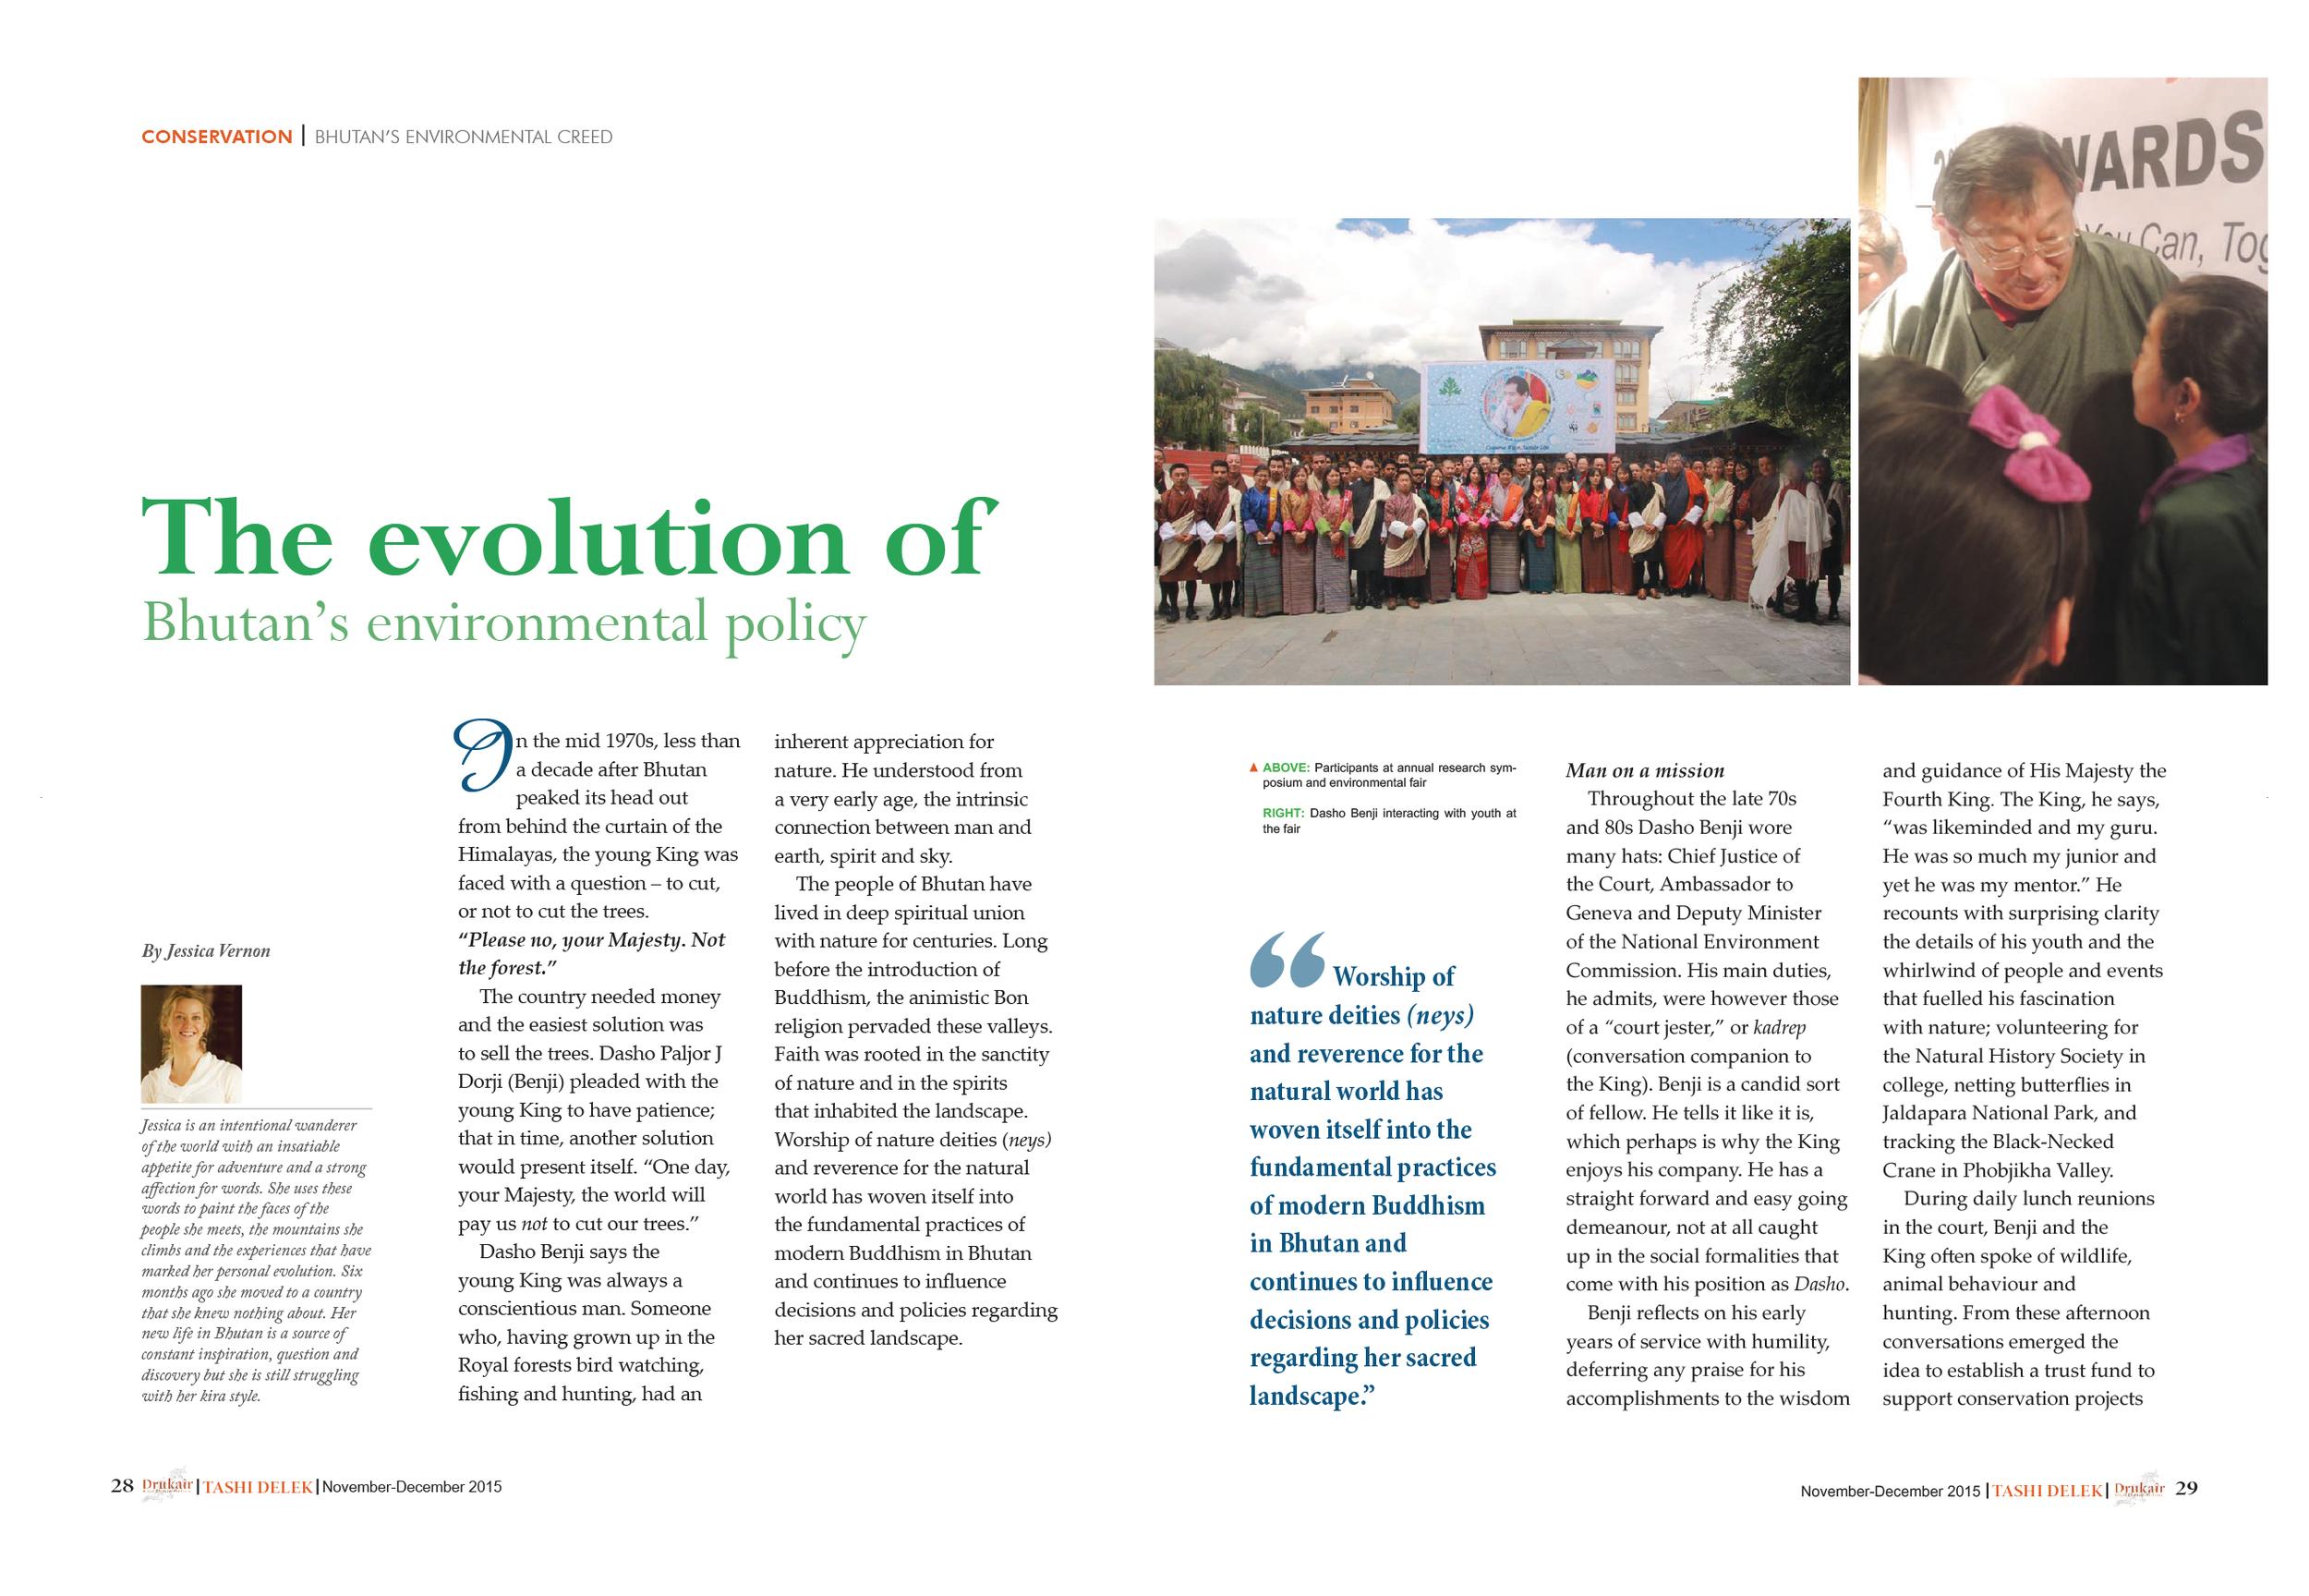 Nov/Dec. 2015: Evolution of Bhutan's Environmental Policy